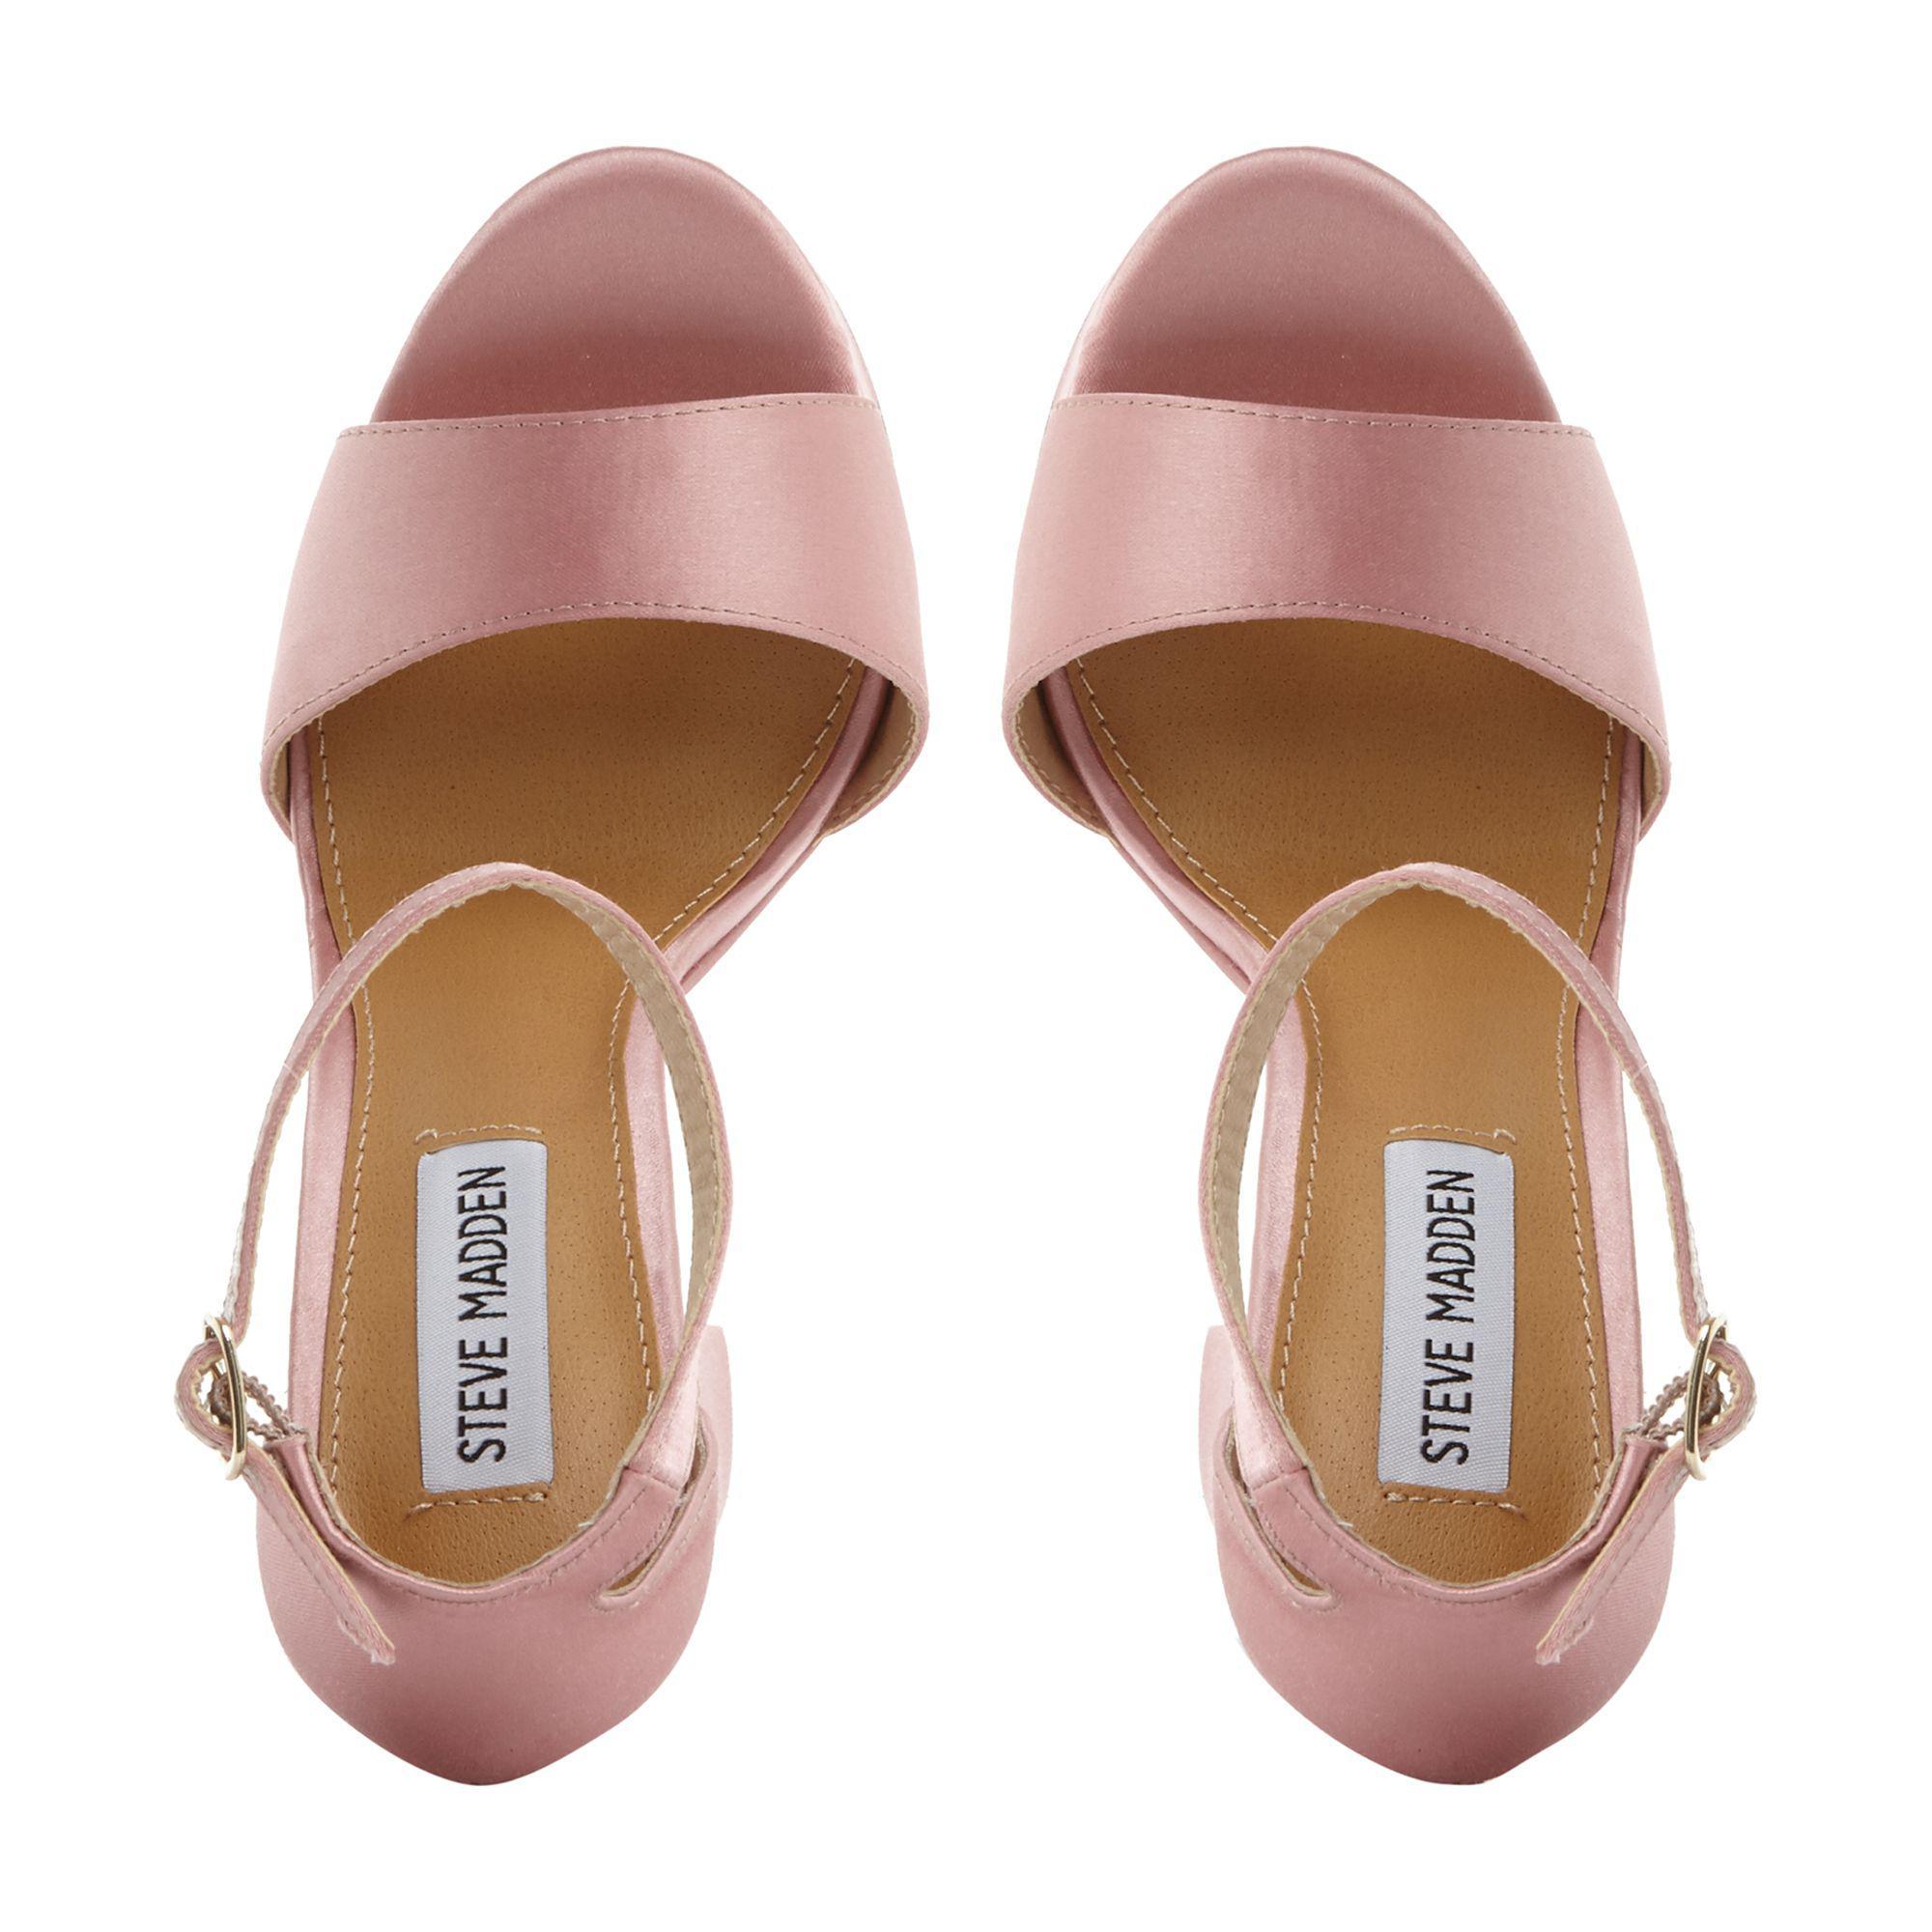 db52099d2135 Steve Madden - Pink Satin  gonzo F  High Platform Ankle Strap Sandals - Lyst.  View fullscreen